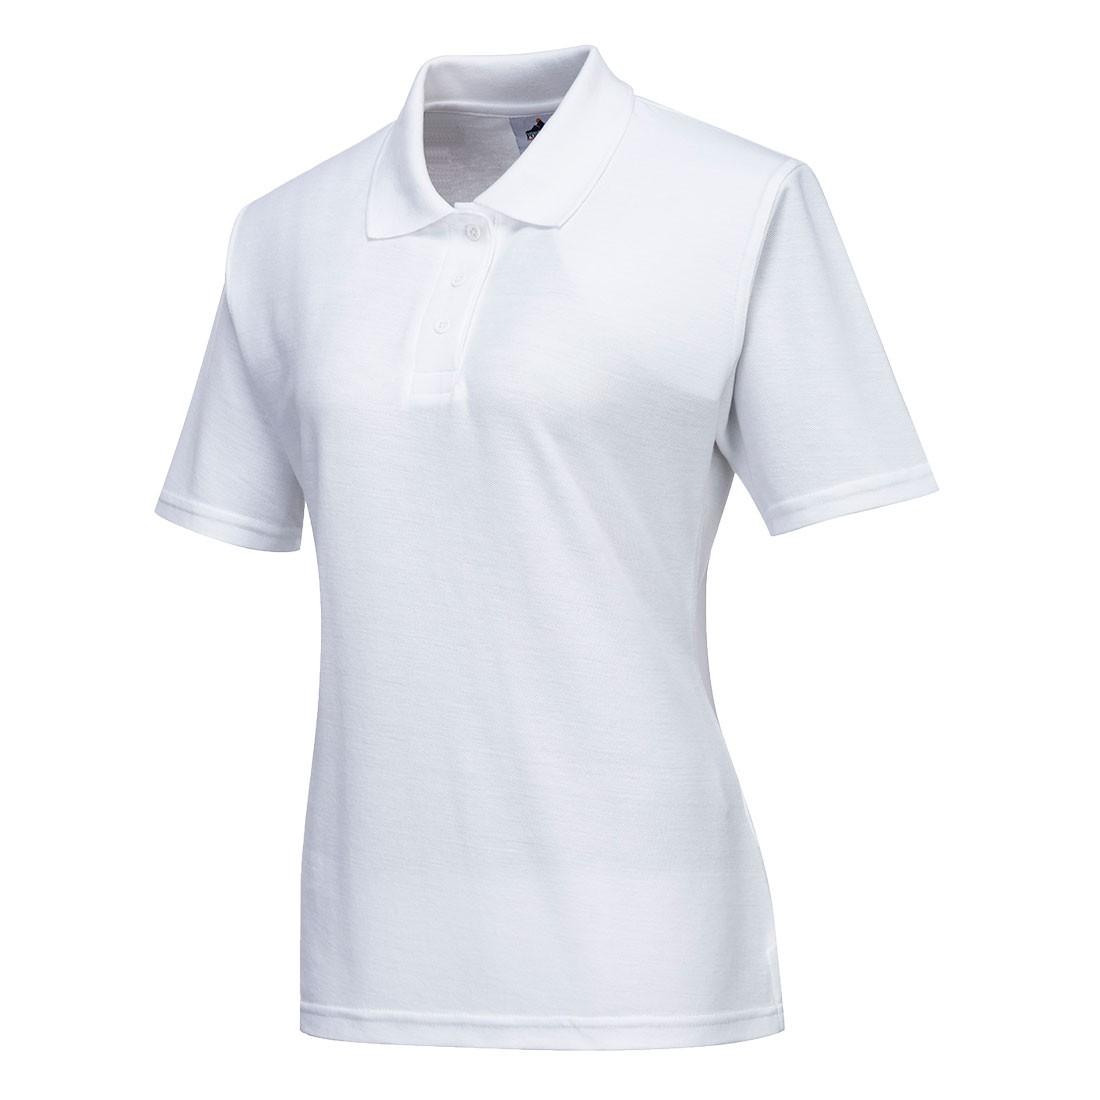 Naples Dames Poloshirt